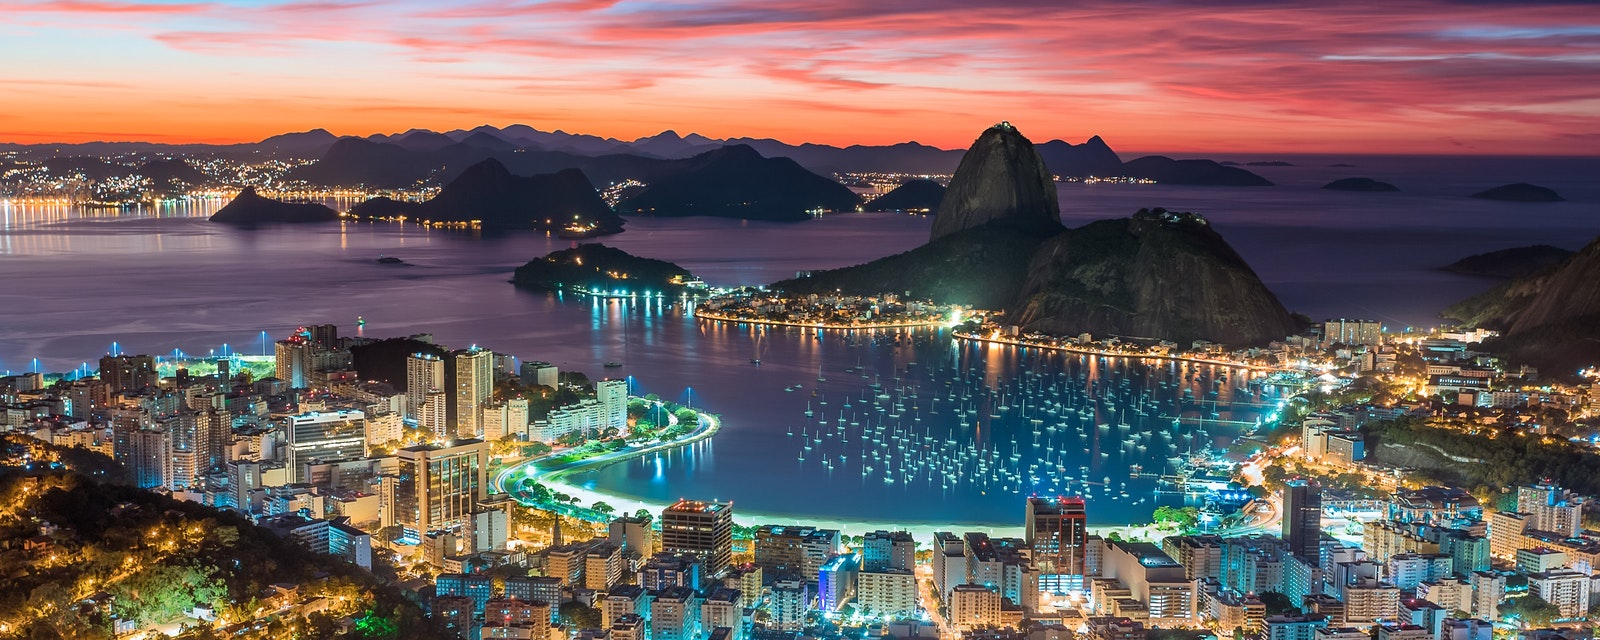 Sunset,In,Rio,De,Janeiro,-,Brazil